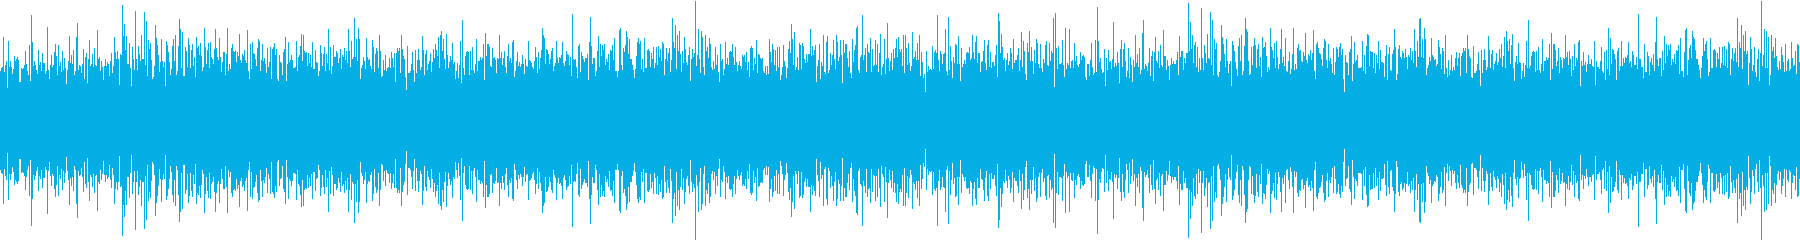 SunaArashi TVの砂嵐 1の再生済みの波形